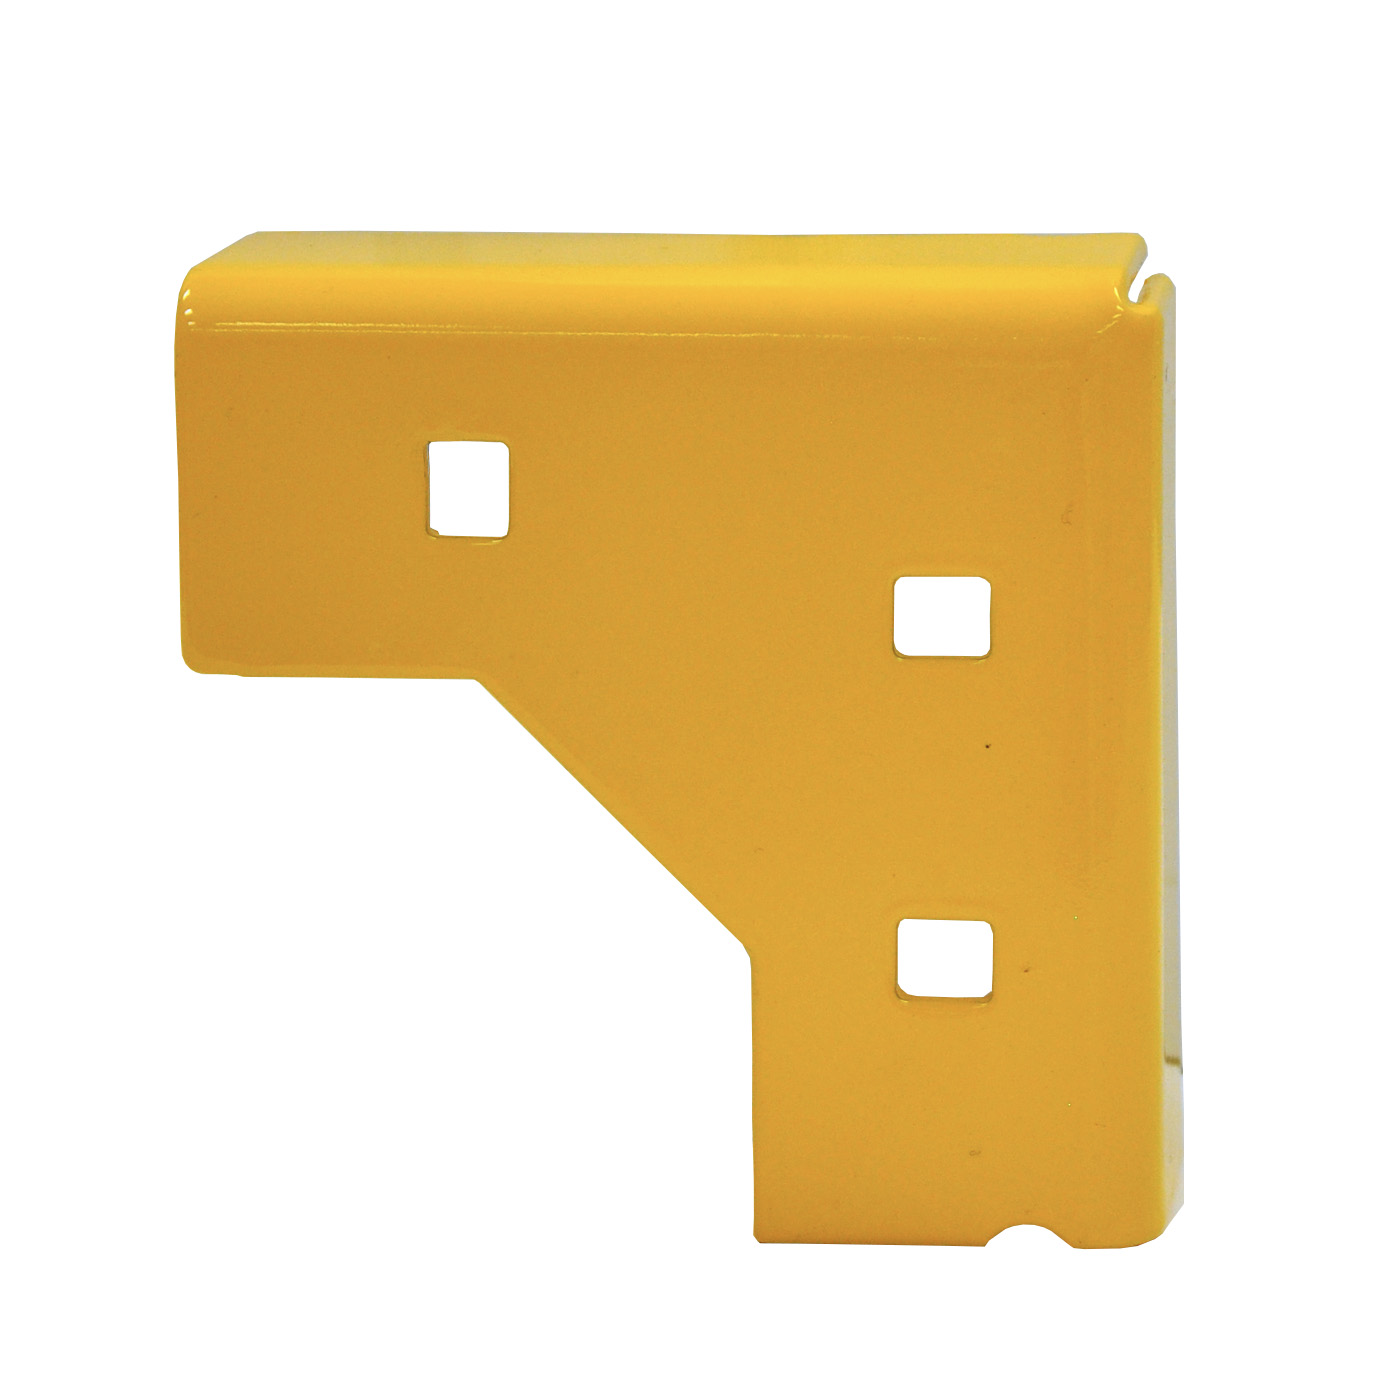 A12829-rh-hinge-gate-corner-bracket-1400w